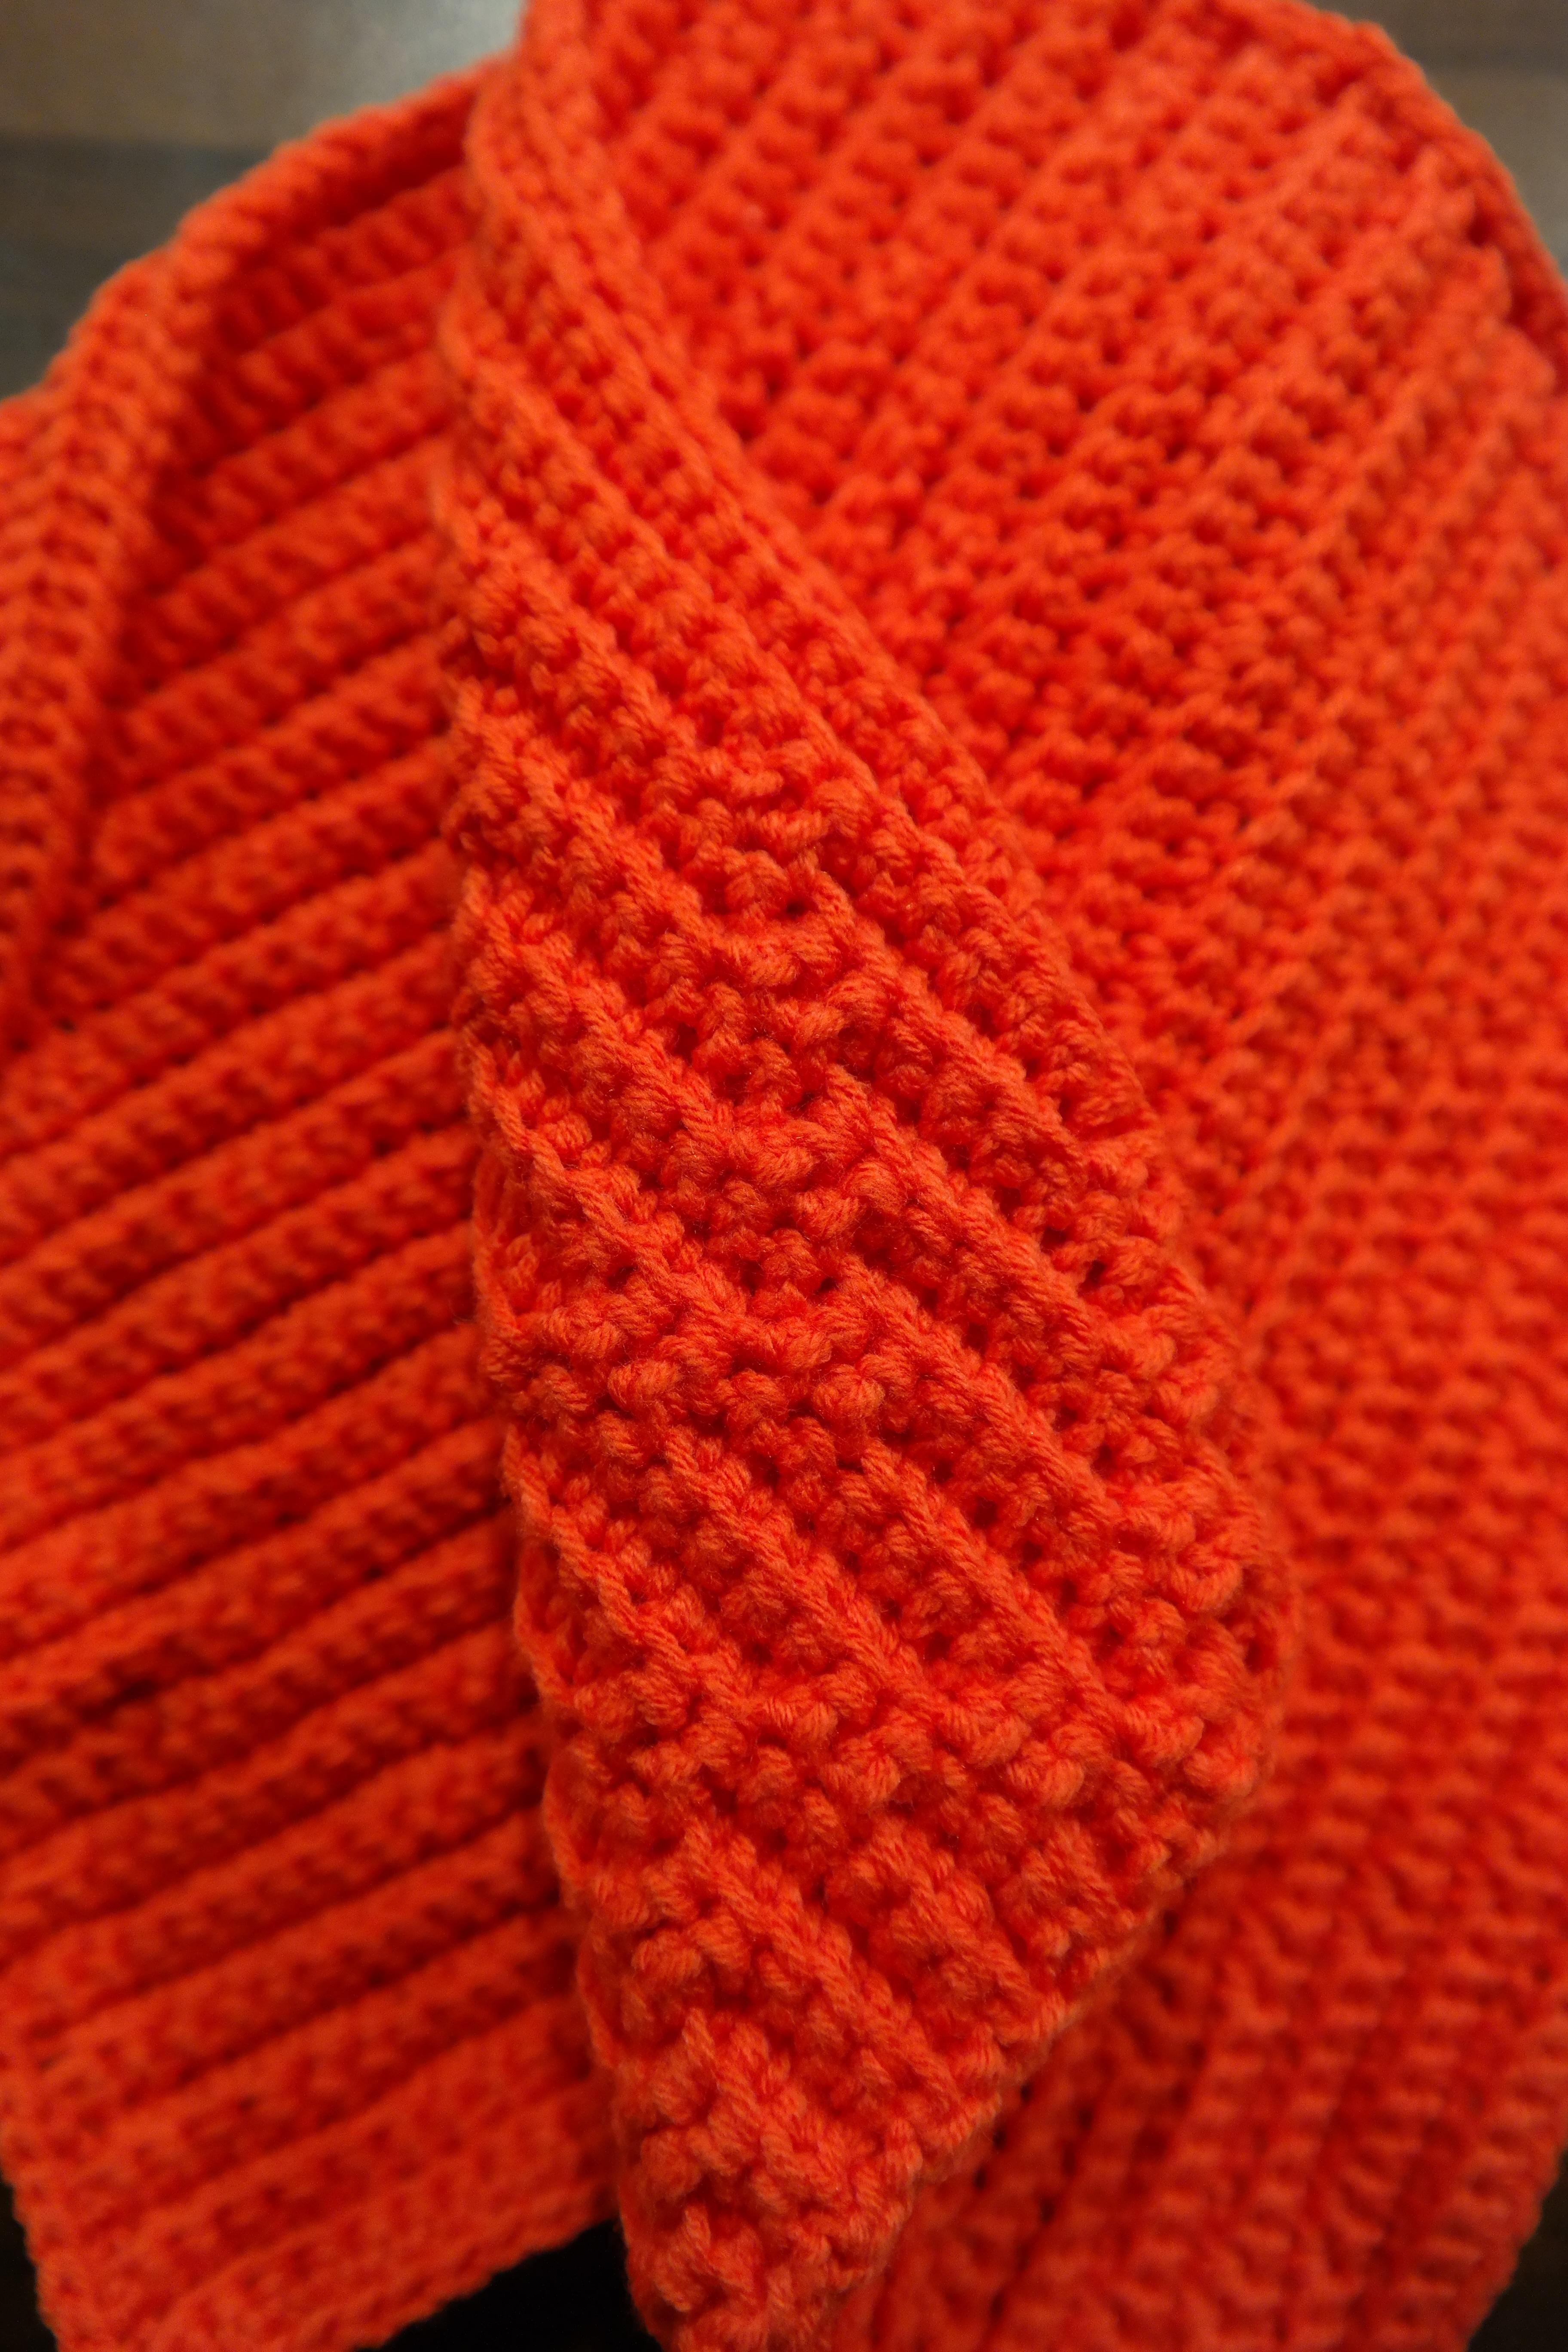 Fotos gratis : naranja, patrón, rojo, ropa, Casco, tela, Gorro, de ...